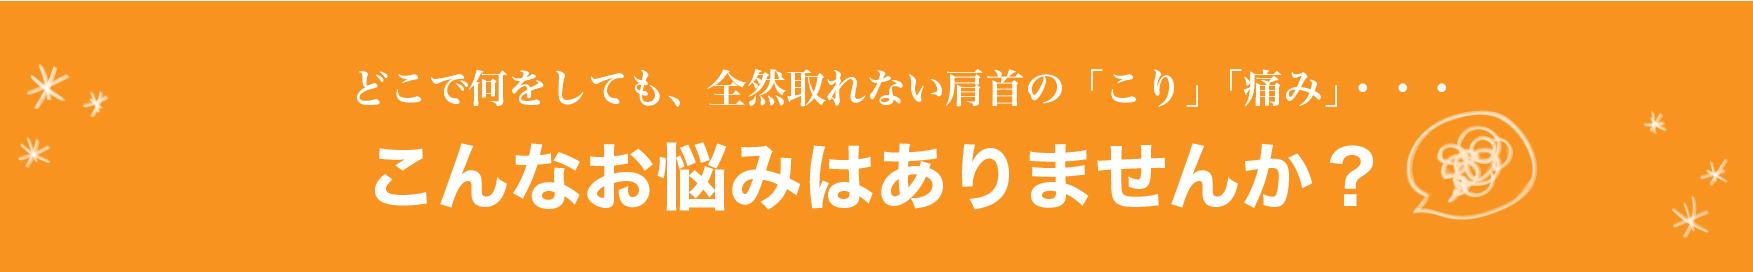 sozai 17 - 当施設紹介